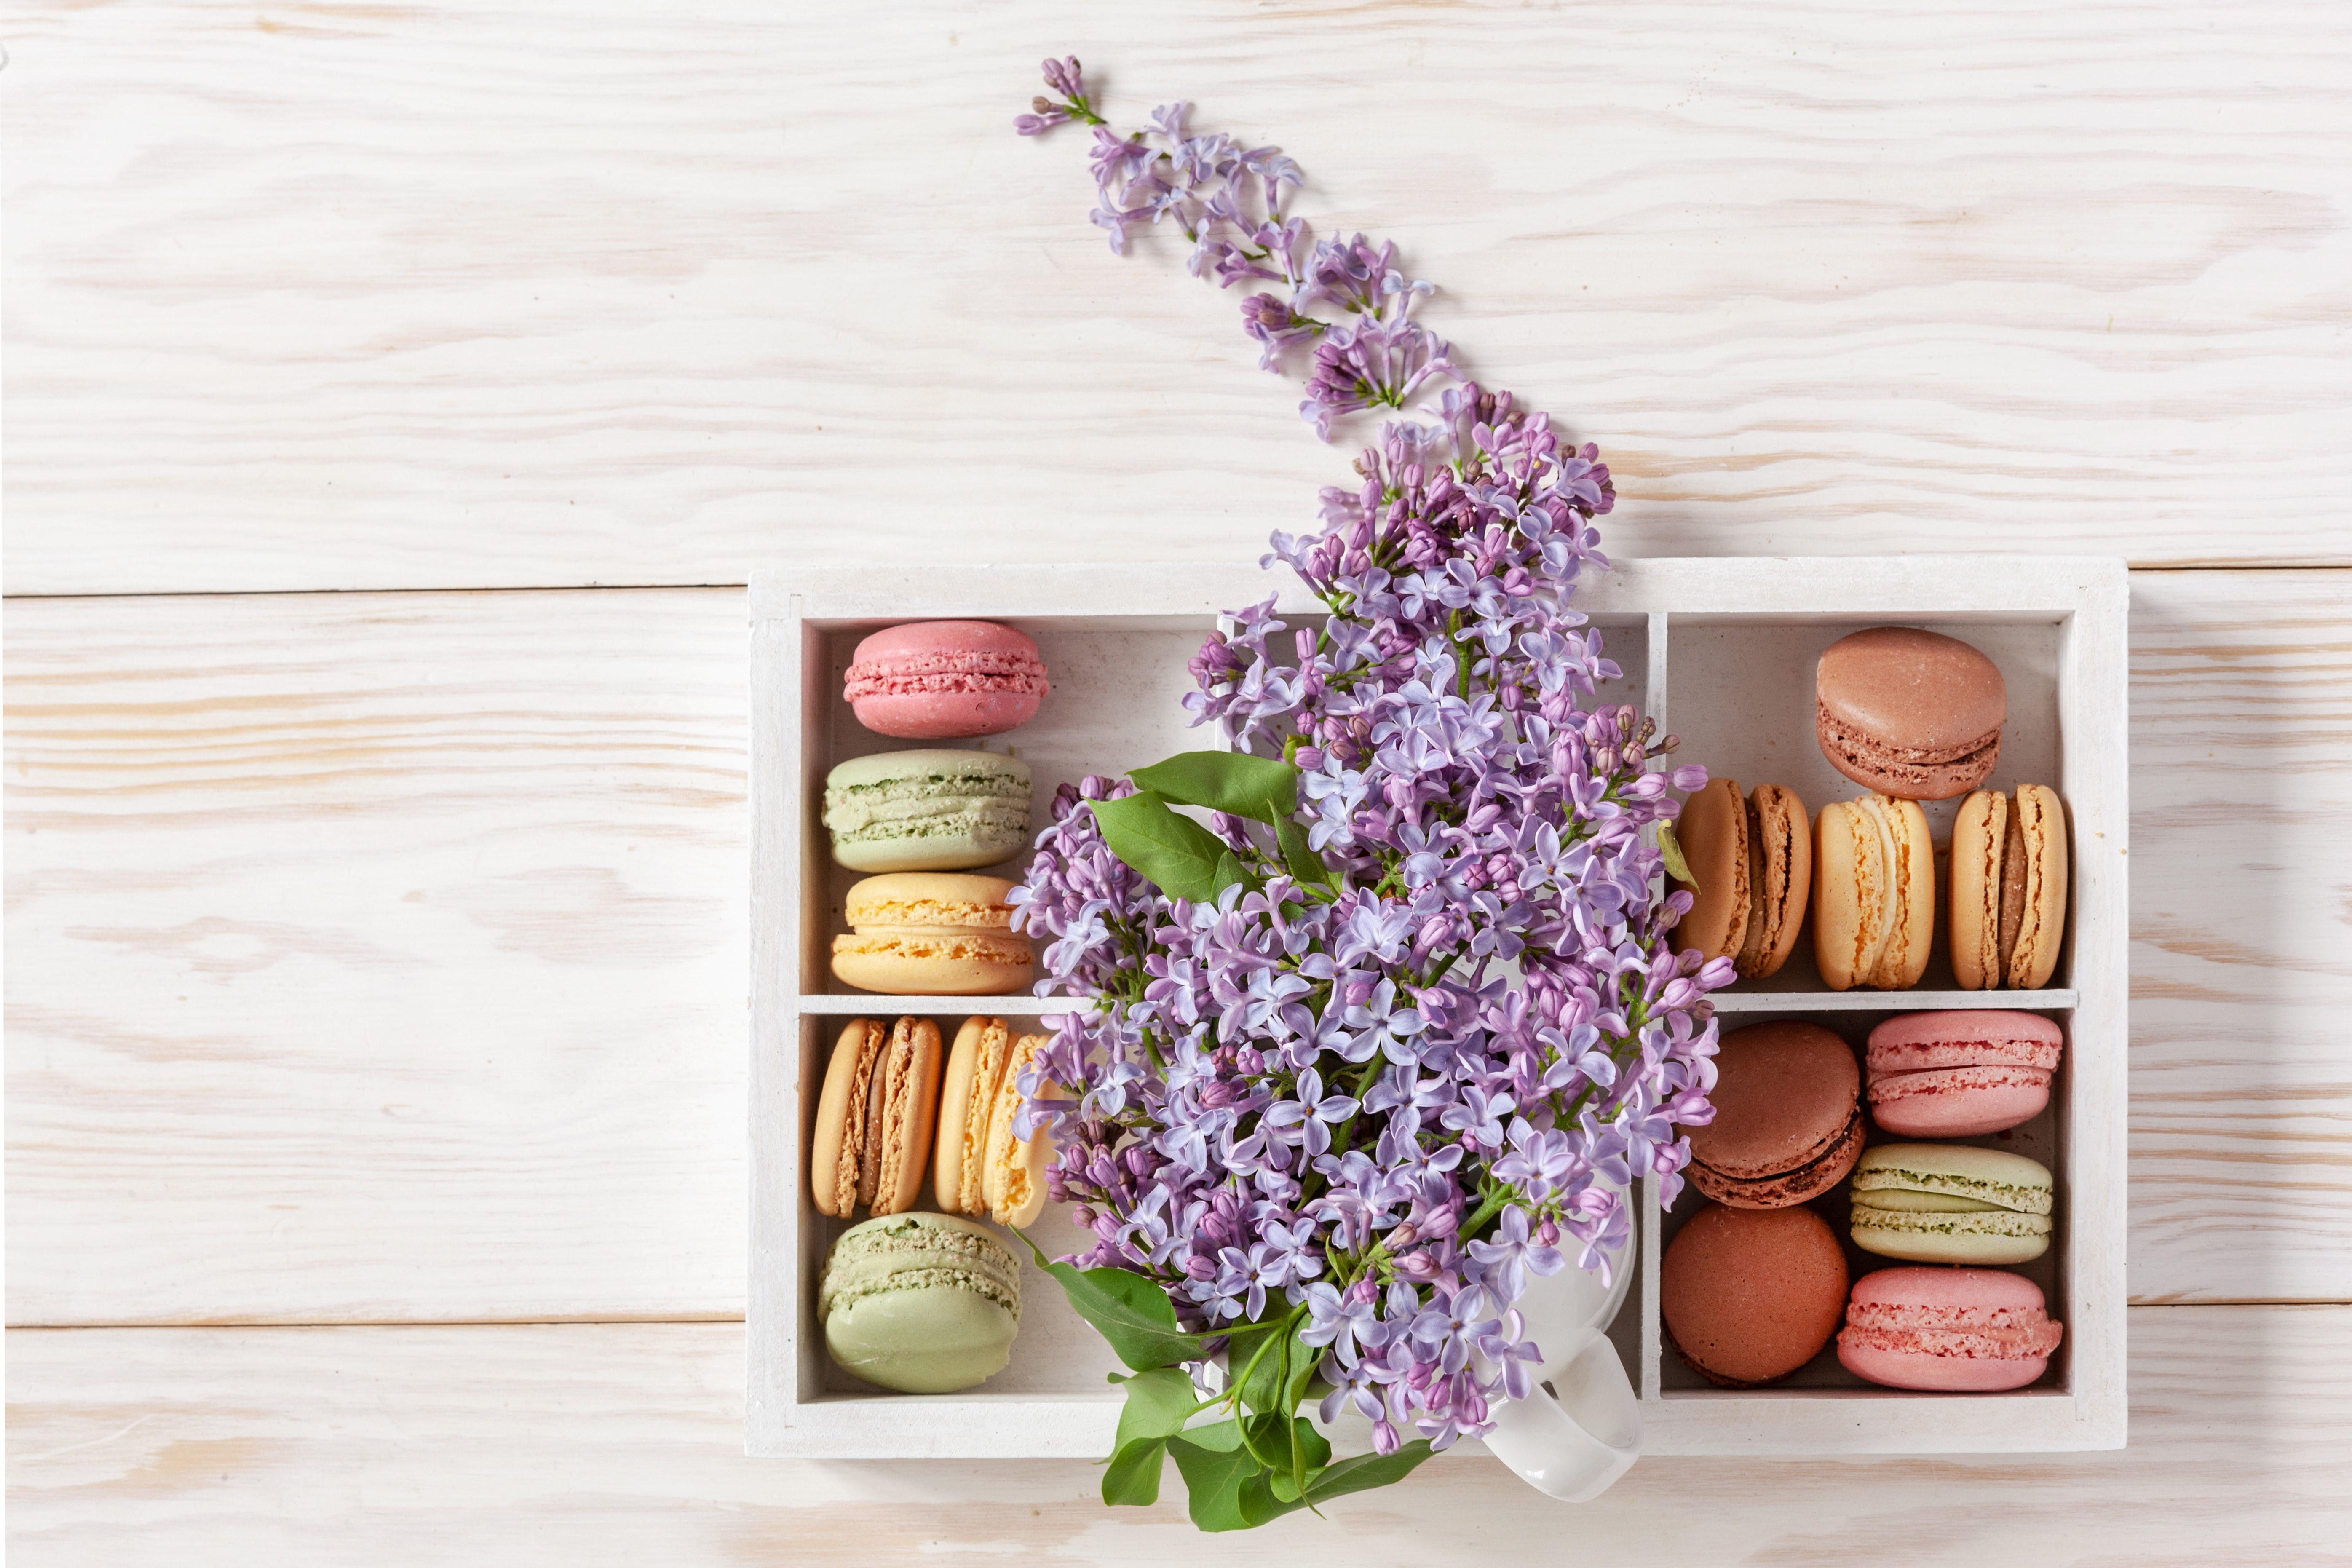 Flower Lilac Macaron Still Life Sweets 5583x3722